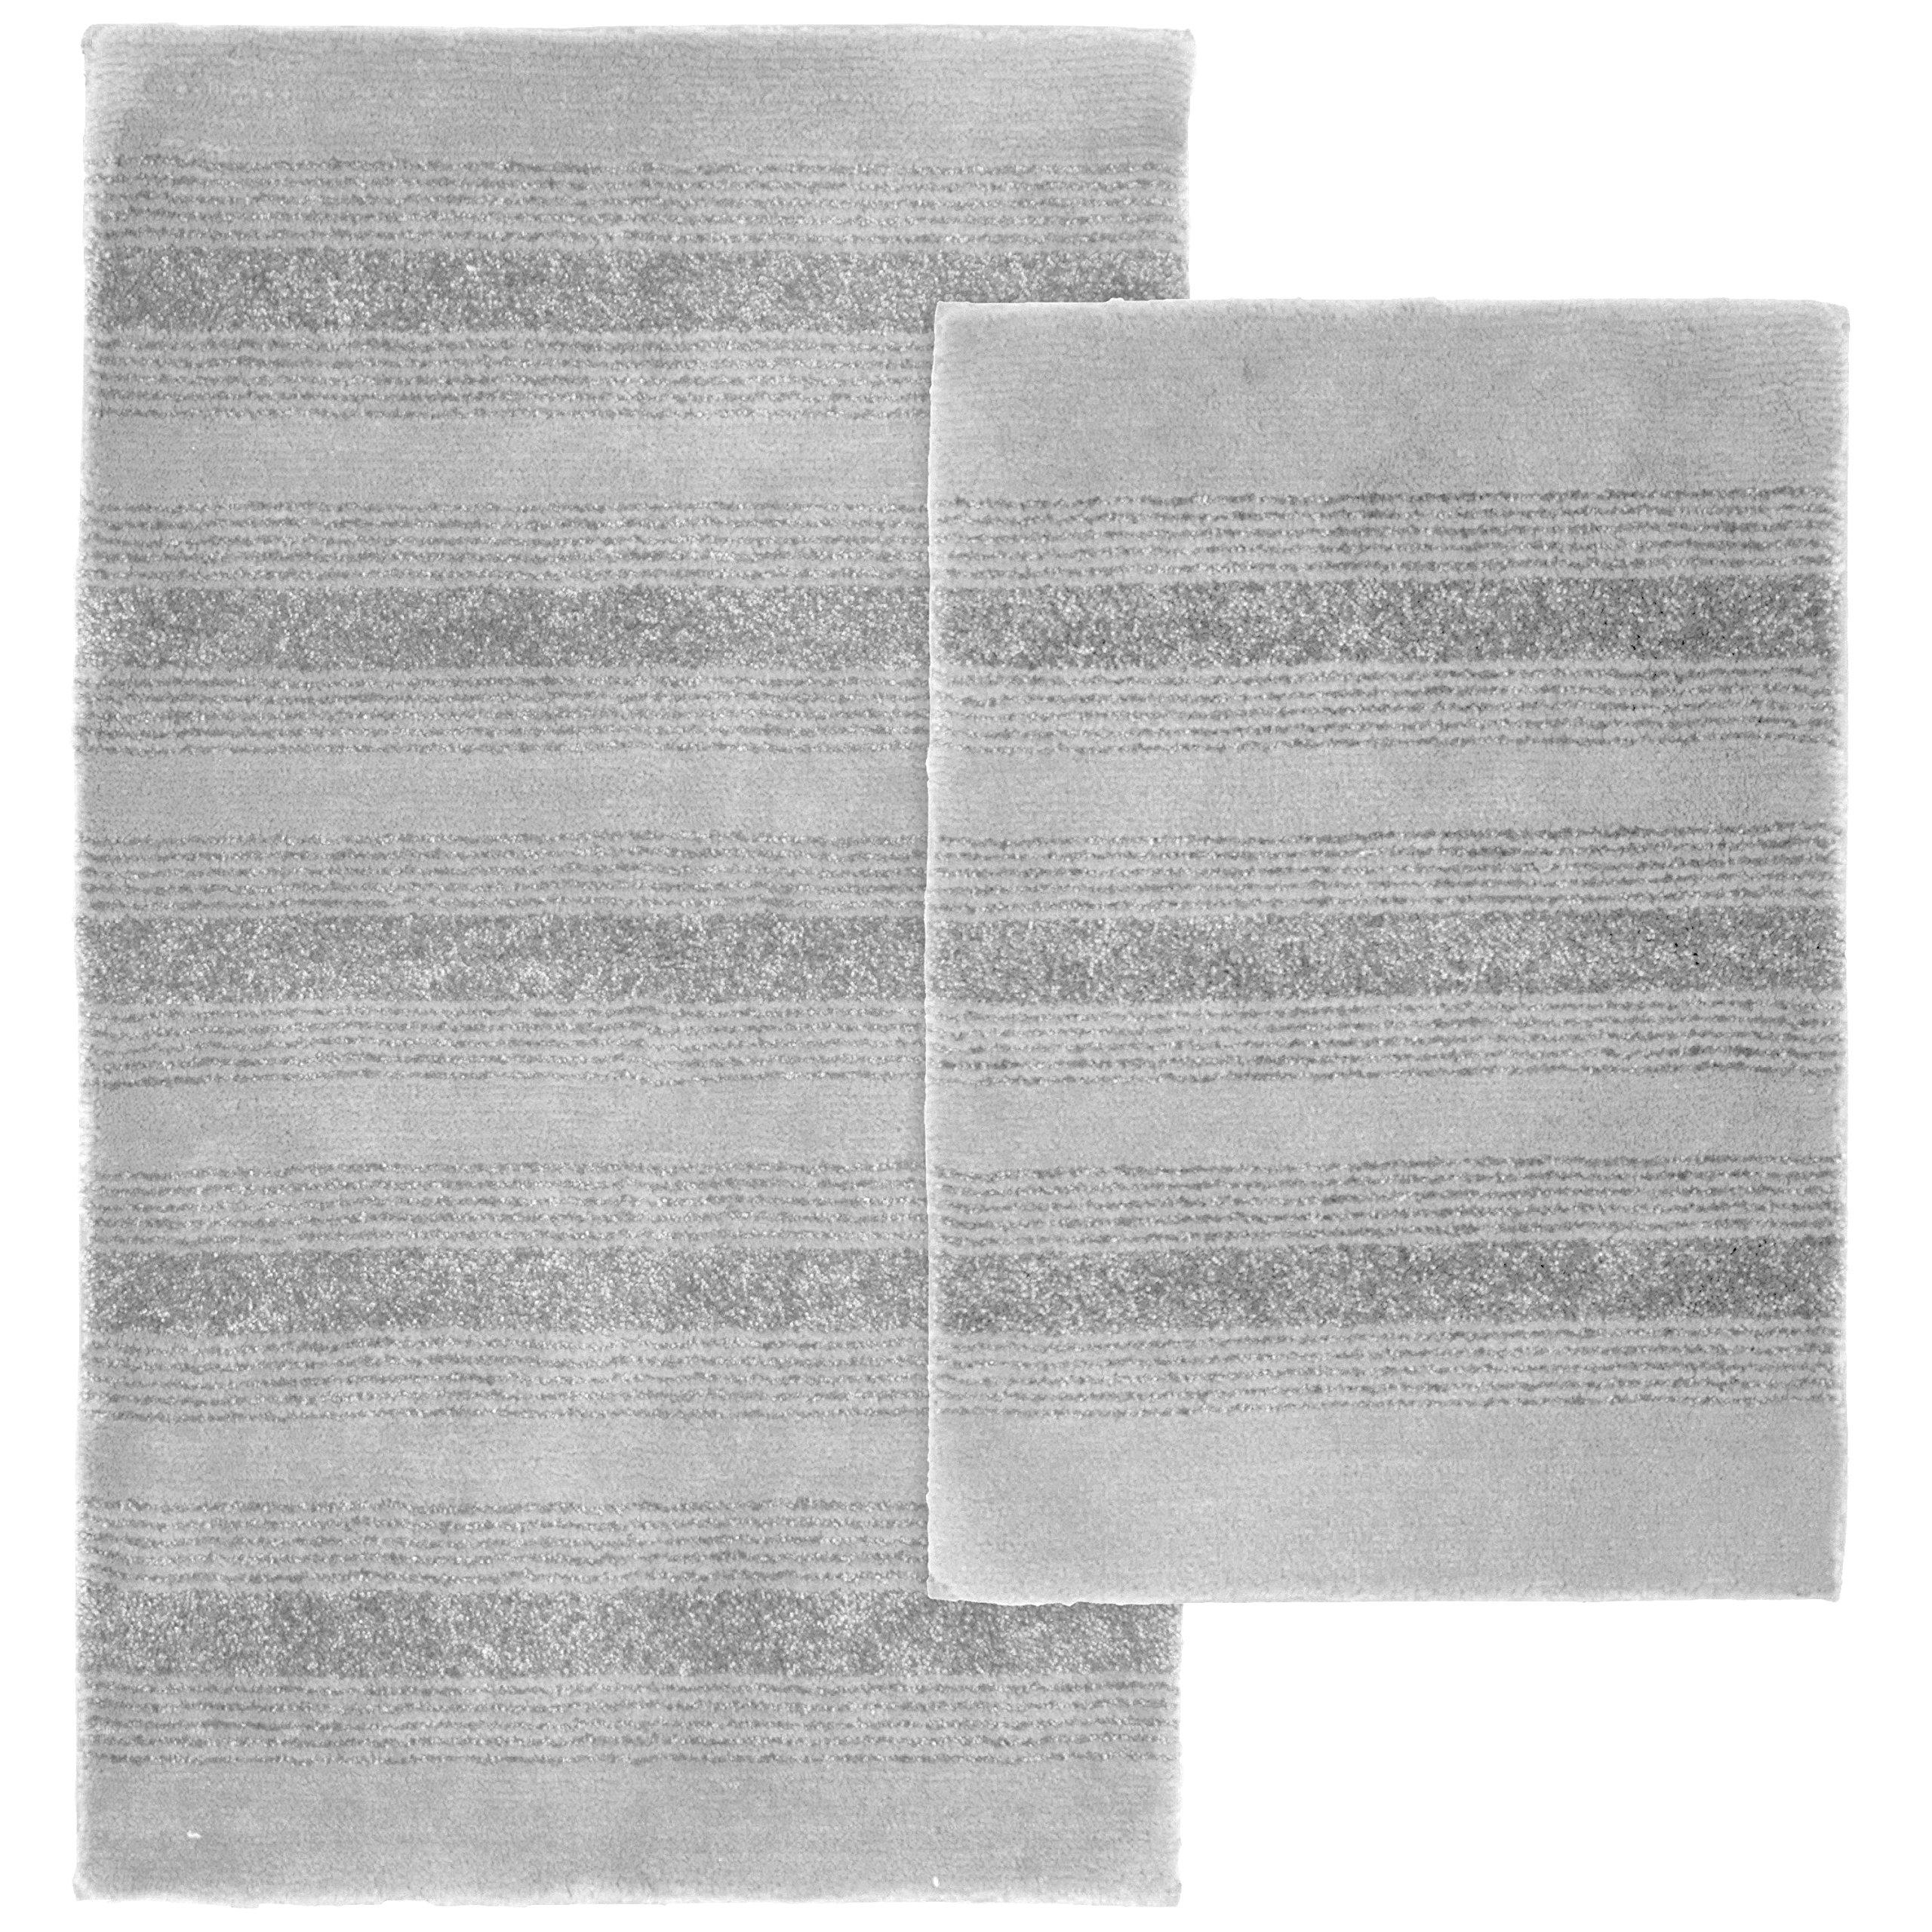 Garland Rug 2-Piece Essence Nylon Washable Bathroom Rug Set, Platinum Gray